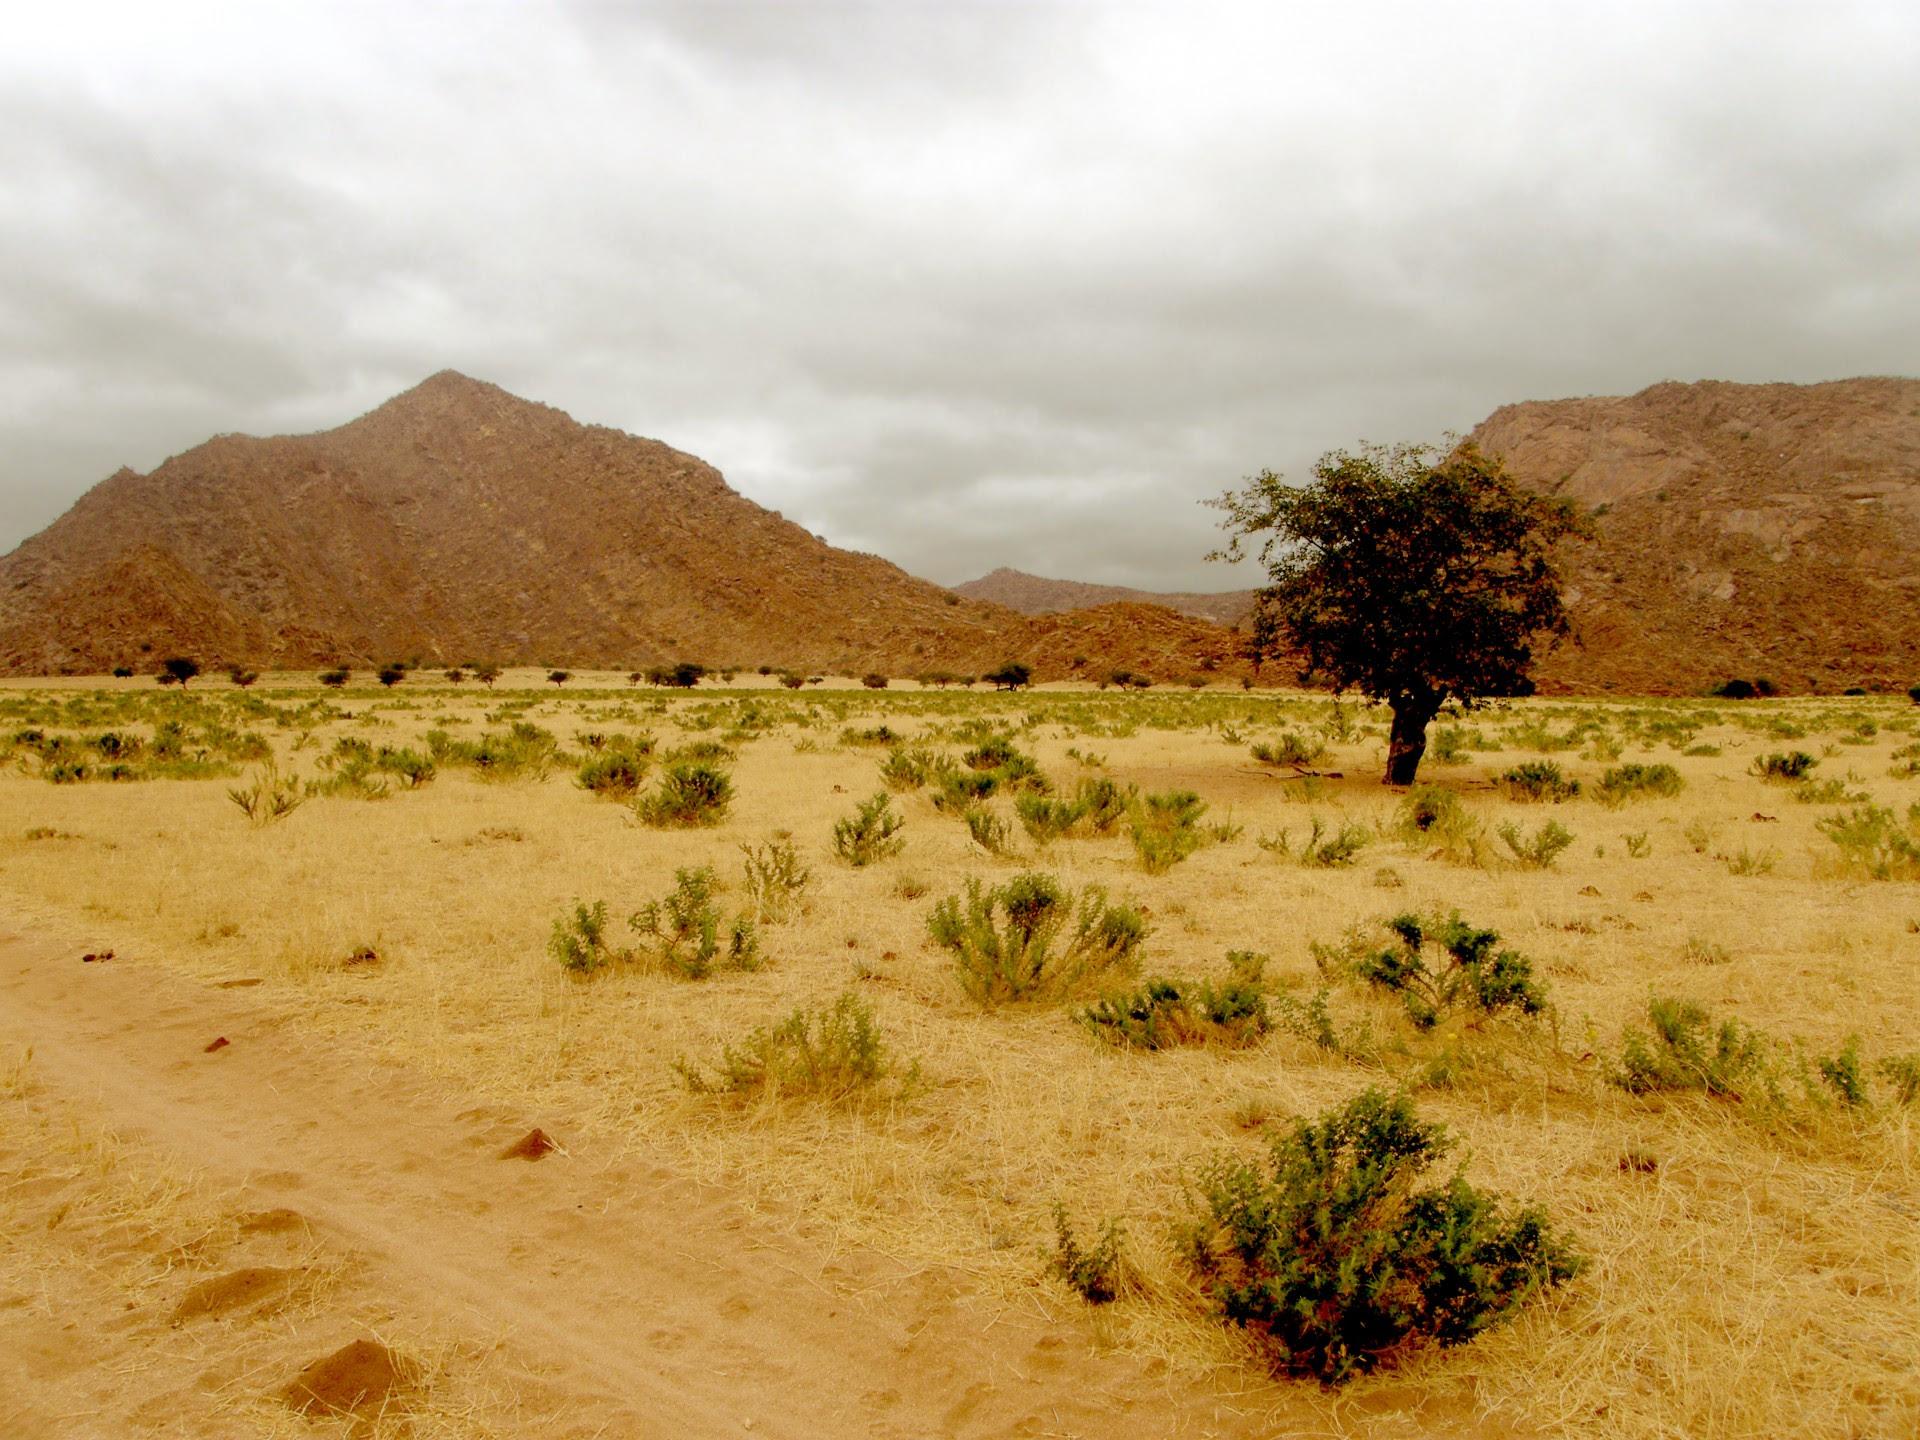 Hills And Desert